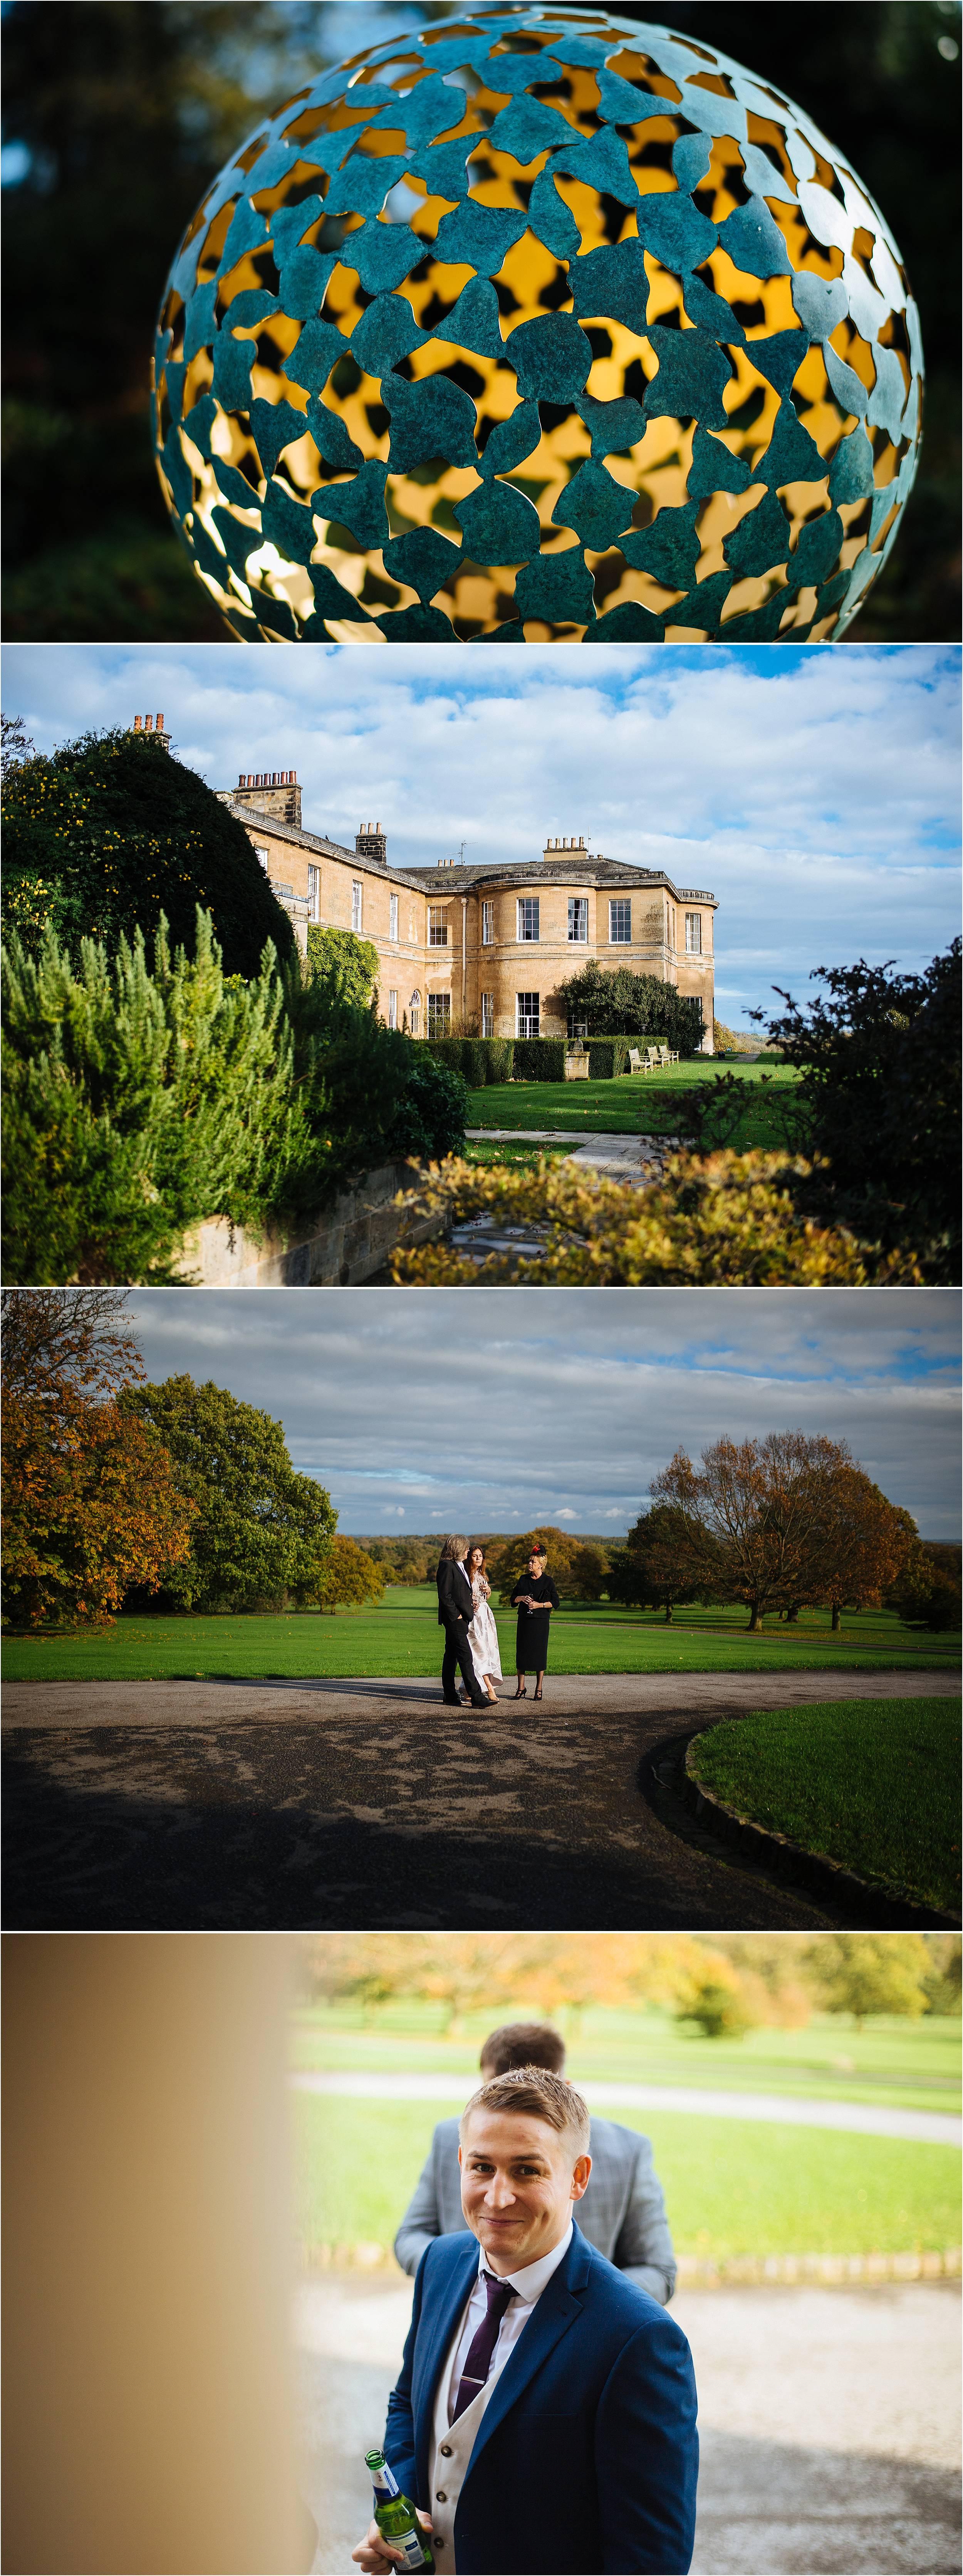 Harrogate Wedding Photography_0128.jpg